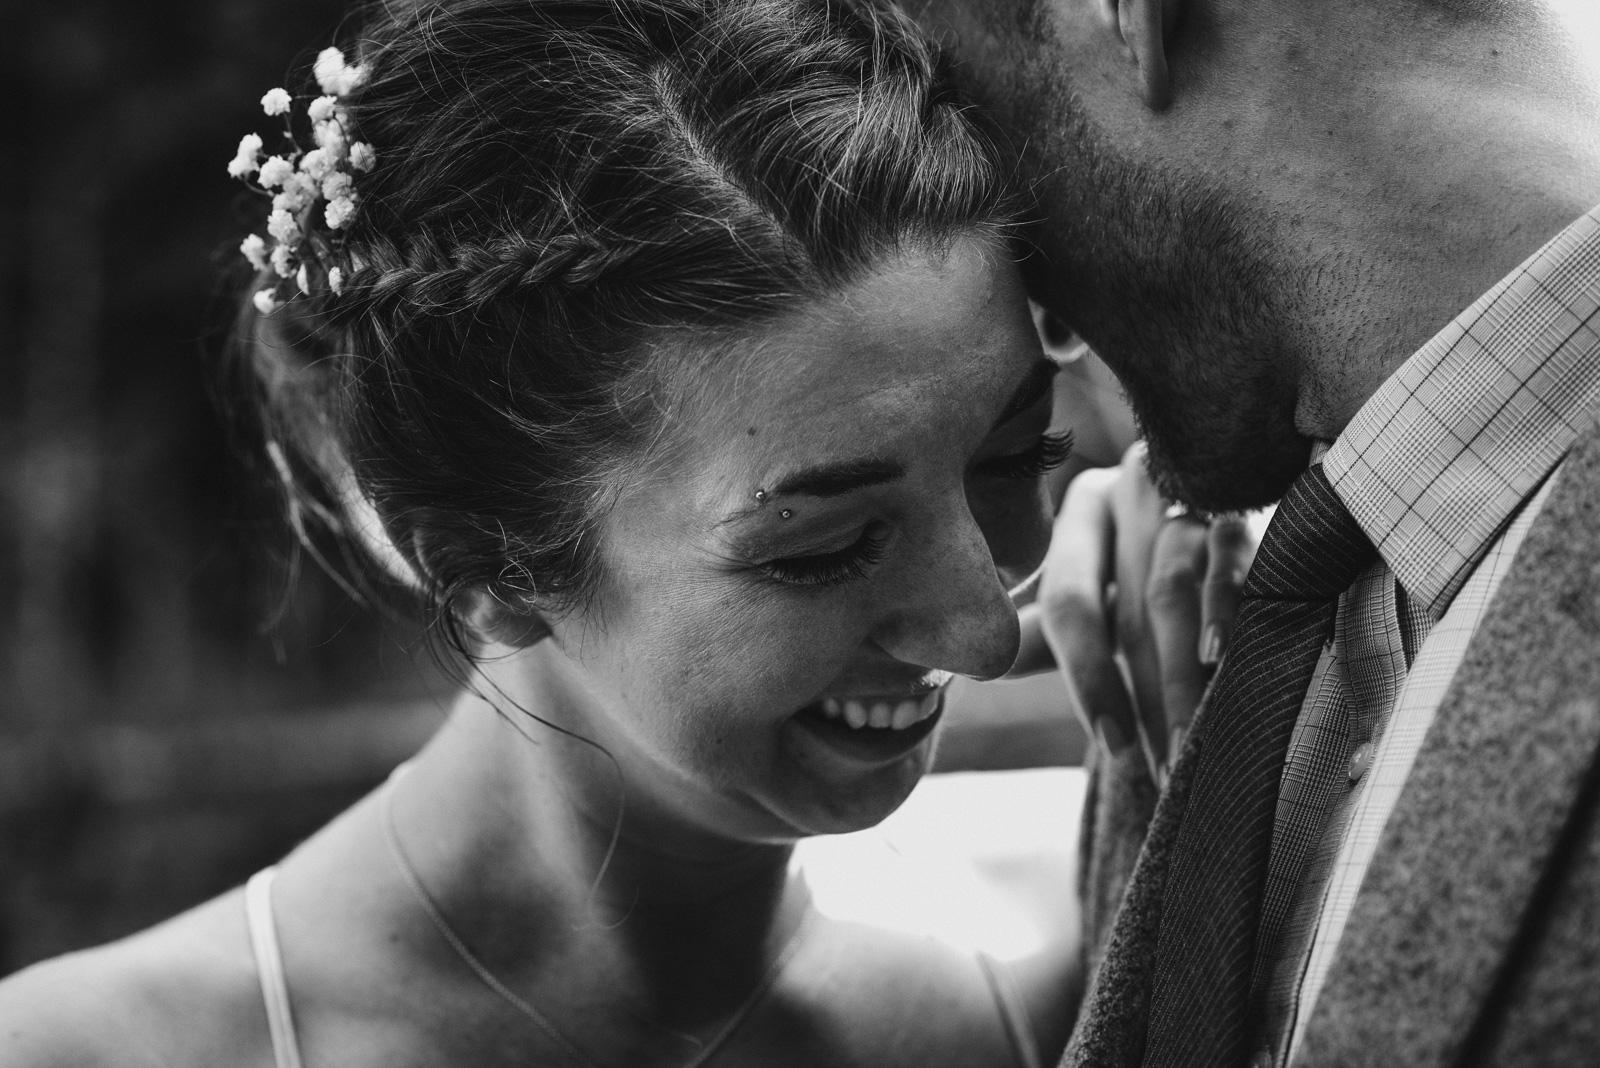 vancouver-island-wedding-photographers-cliff-gilker-park-smugglers-cove-elopement-32.jpg